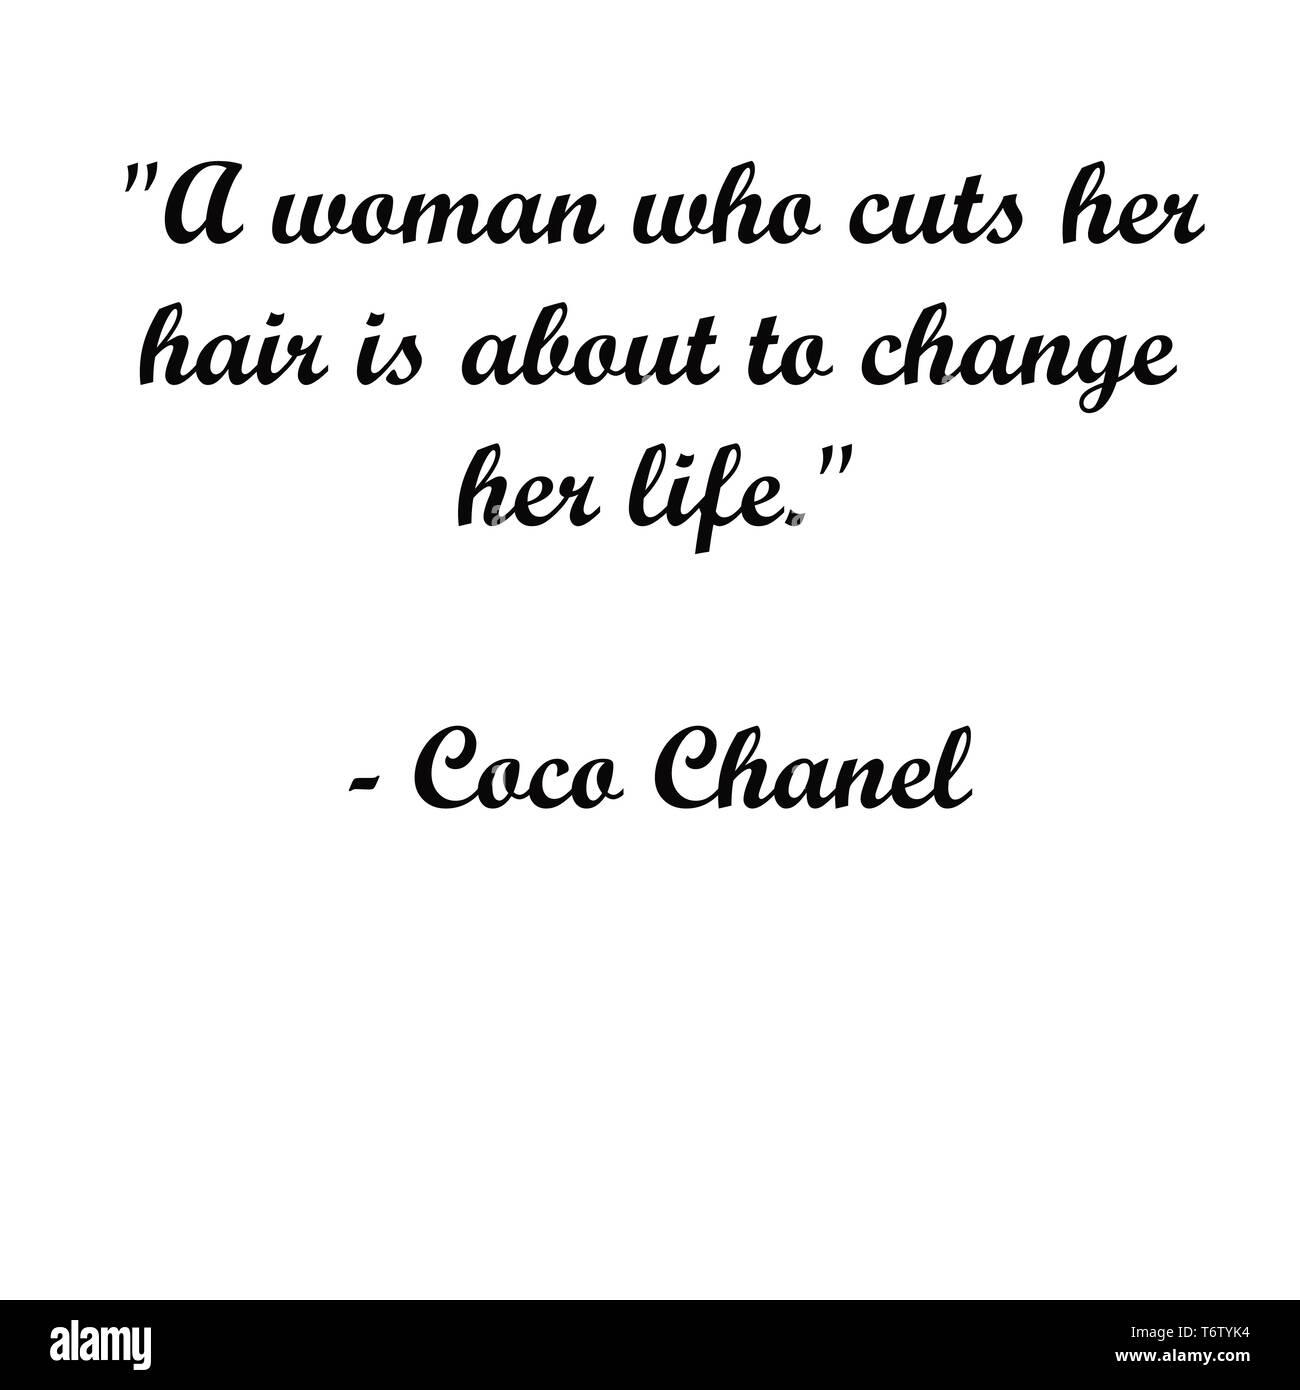 Inspirational Coco Chanel Zitate Moderne Typografie Fur Kunstler